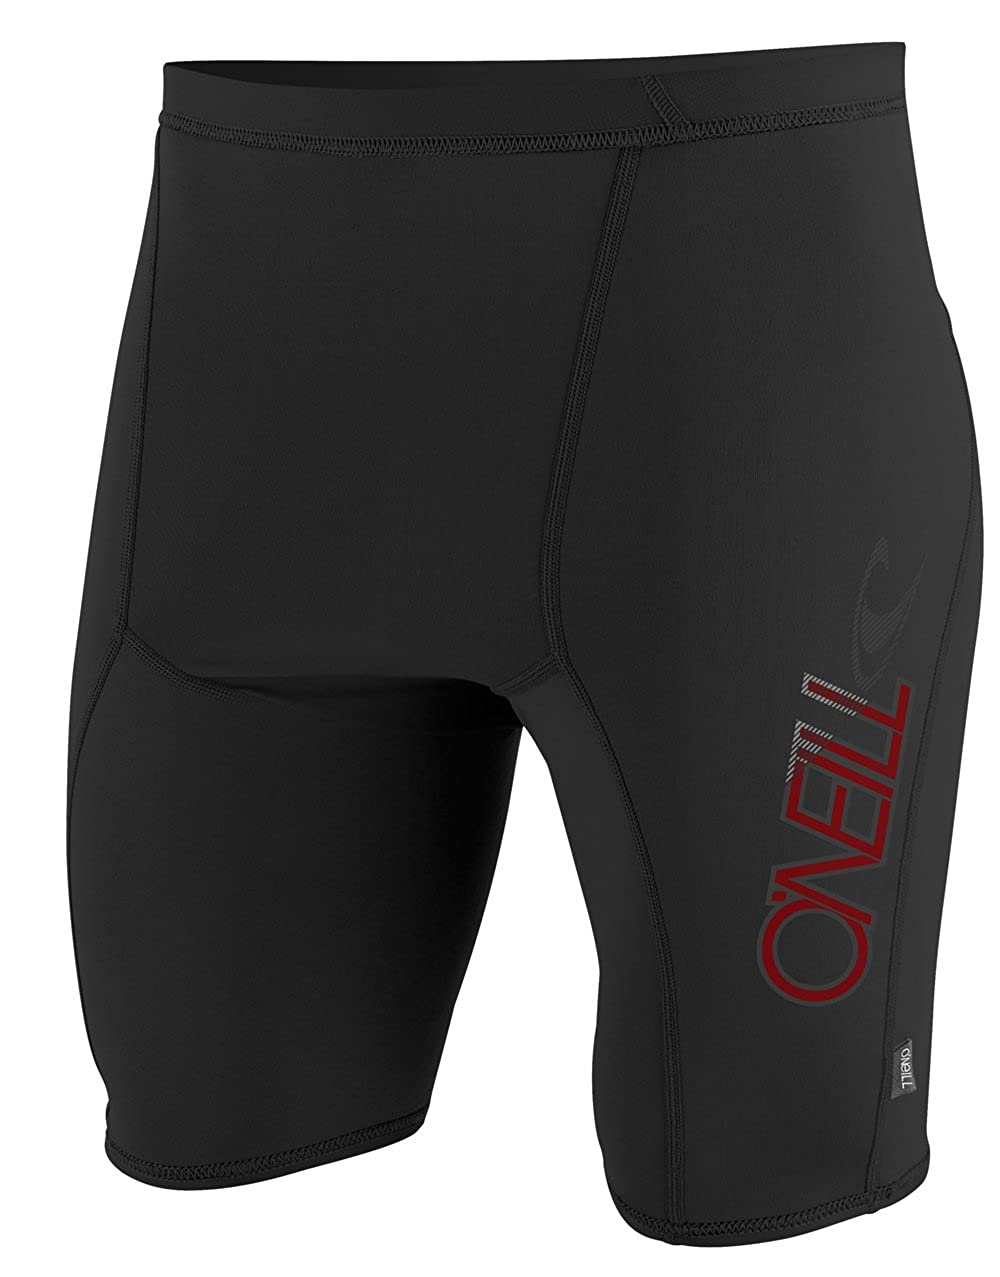 TALLA 2XL. O 'Neill Hombre Skins Pantalones Cortos UV Sol Protección